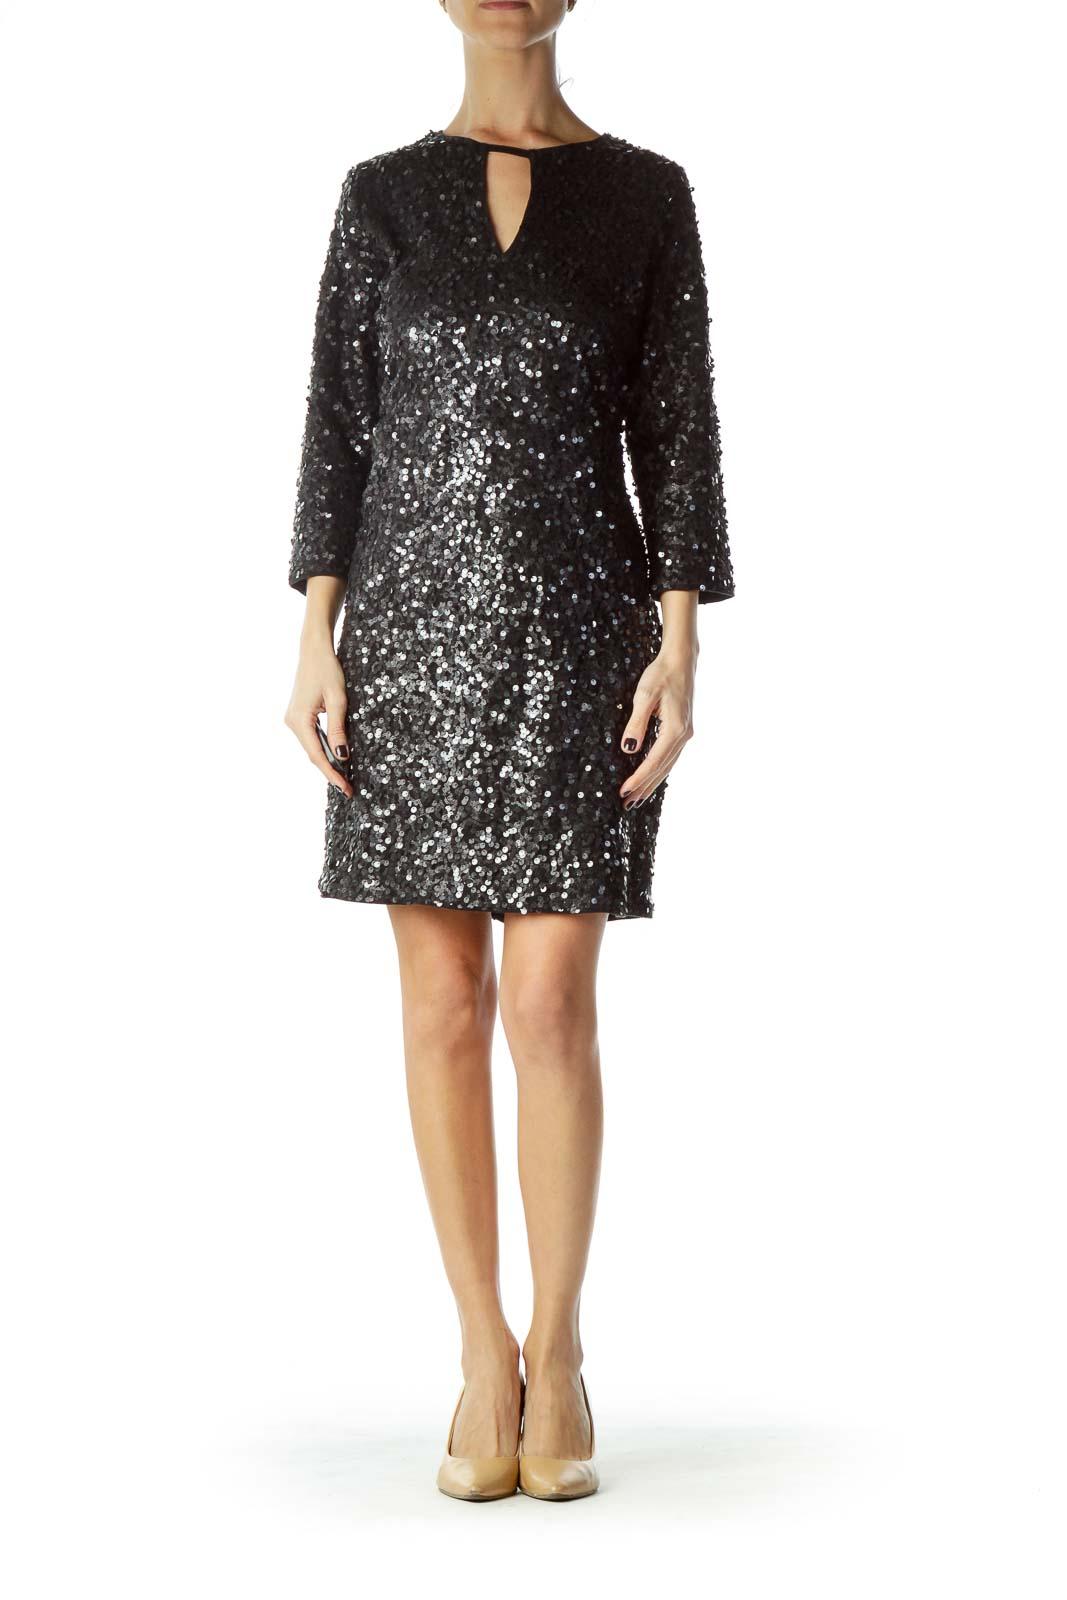 Black Silver Sequined Glitter Dress